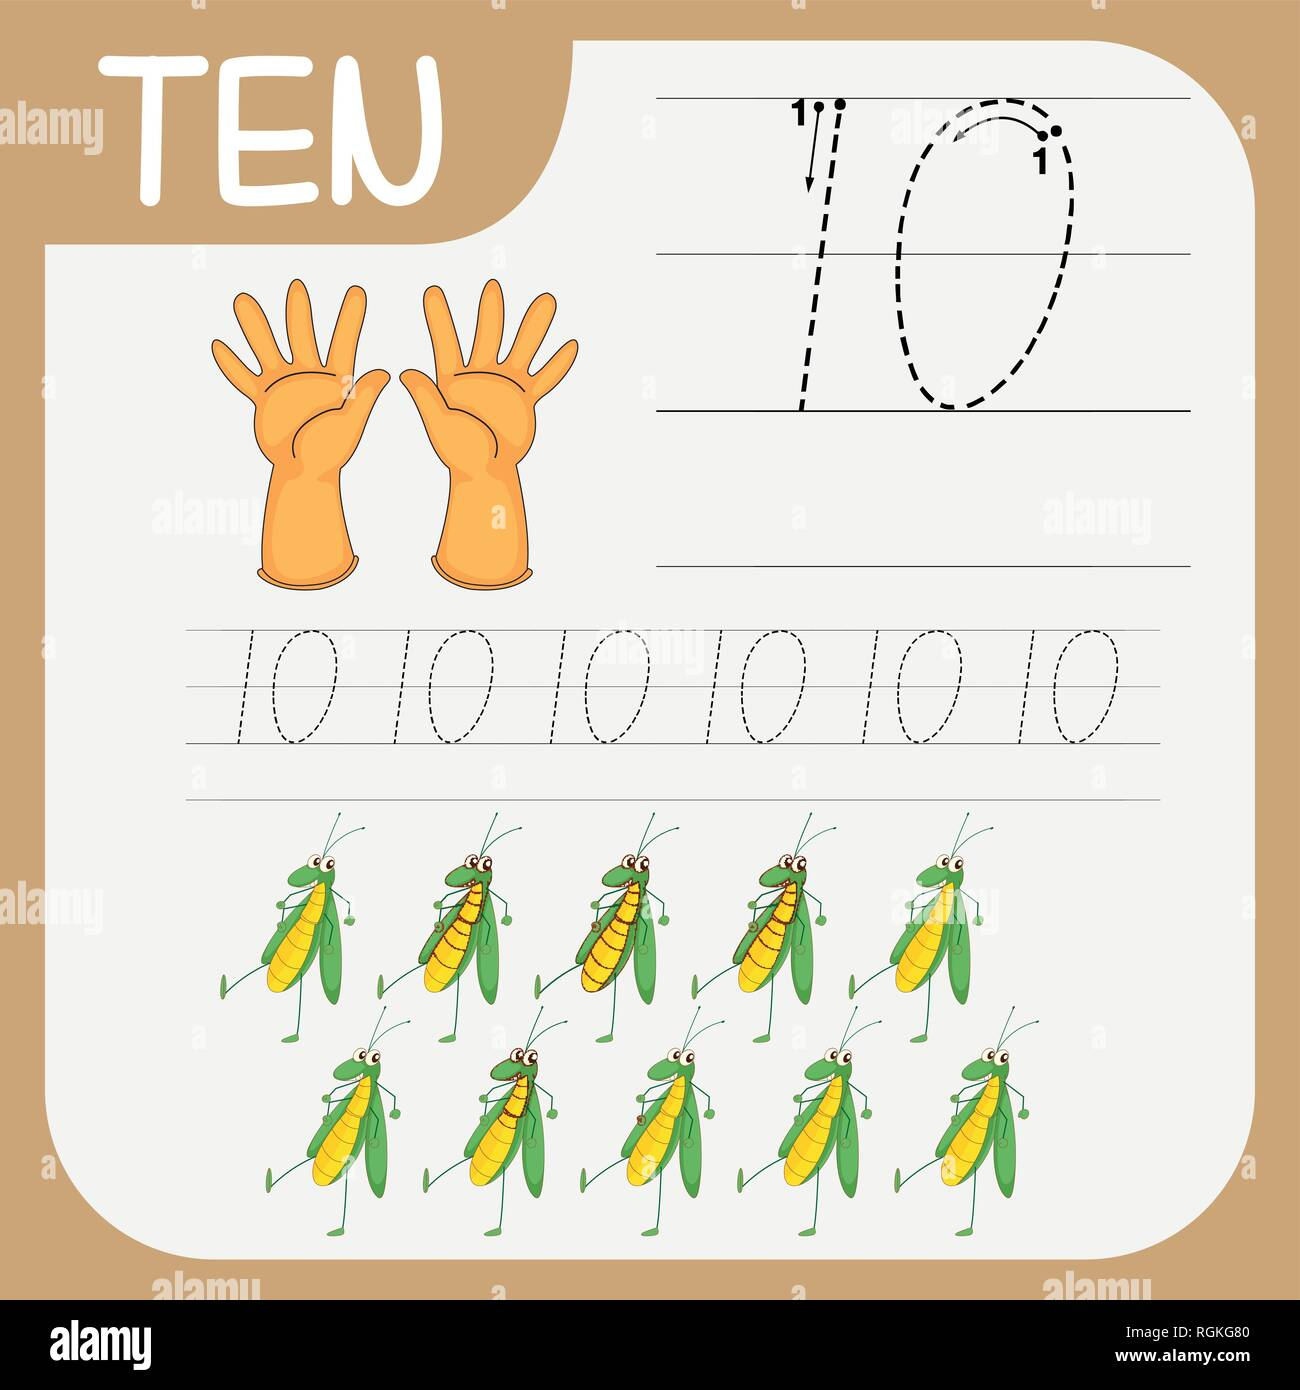 Number Ten Tracing Worksheets Illustration Stock Vector Art Amp Illustration Vector Image